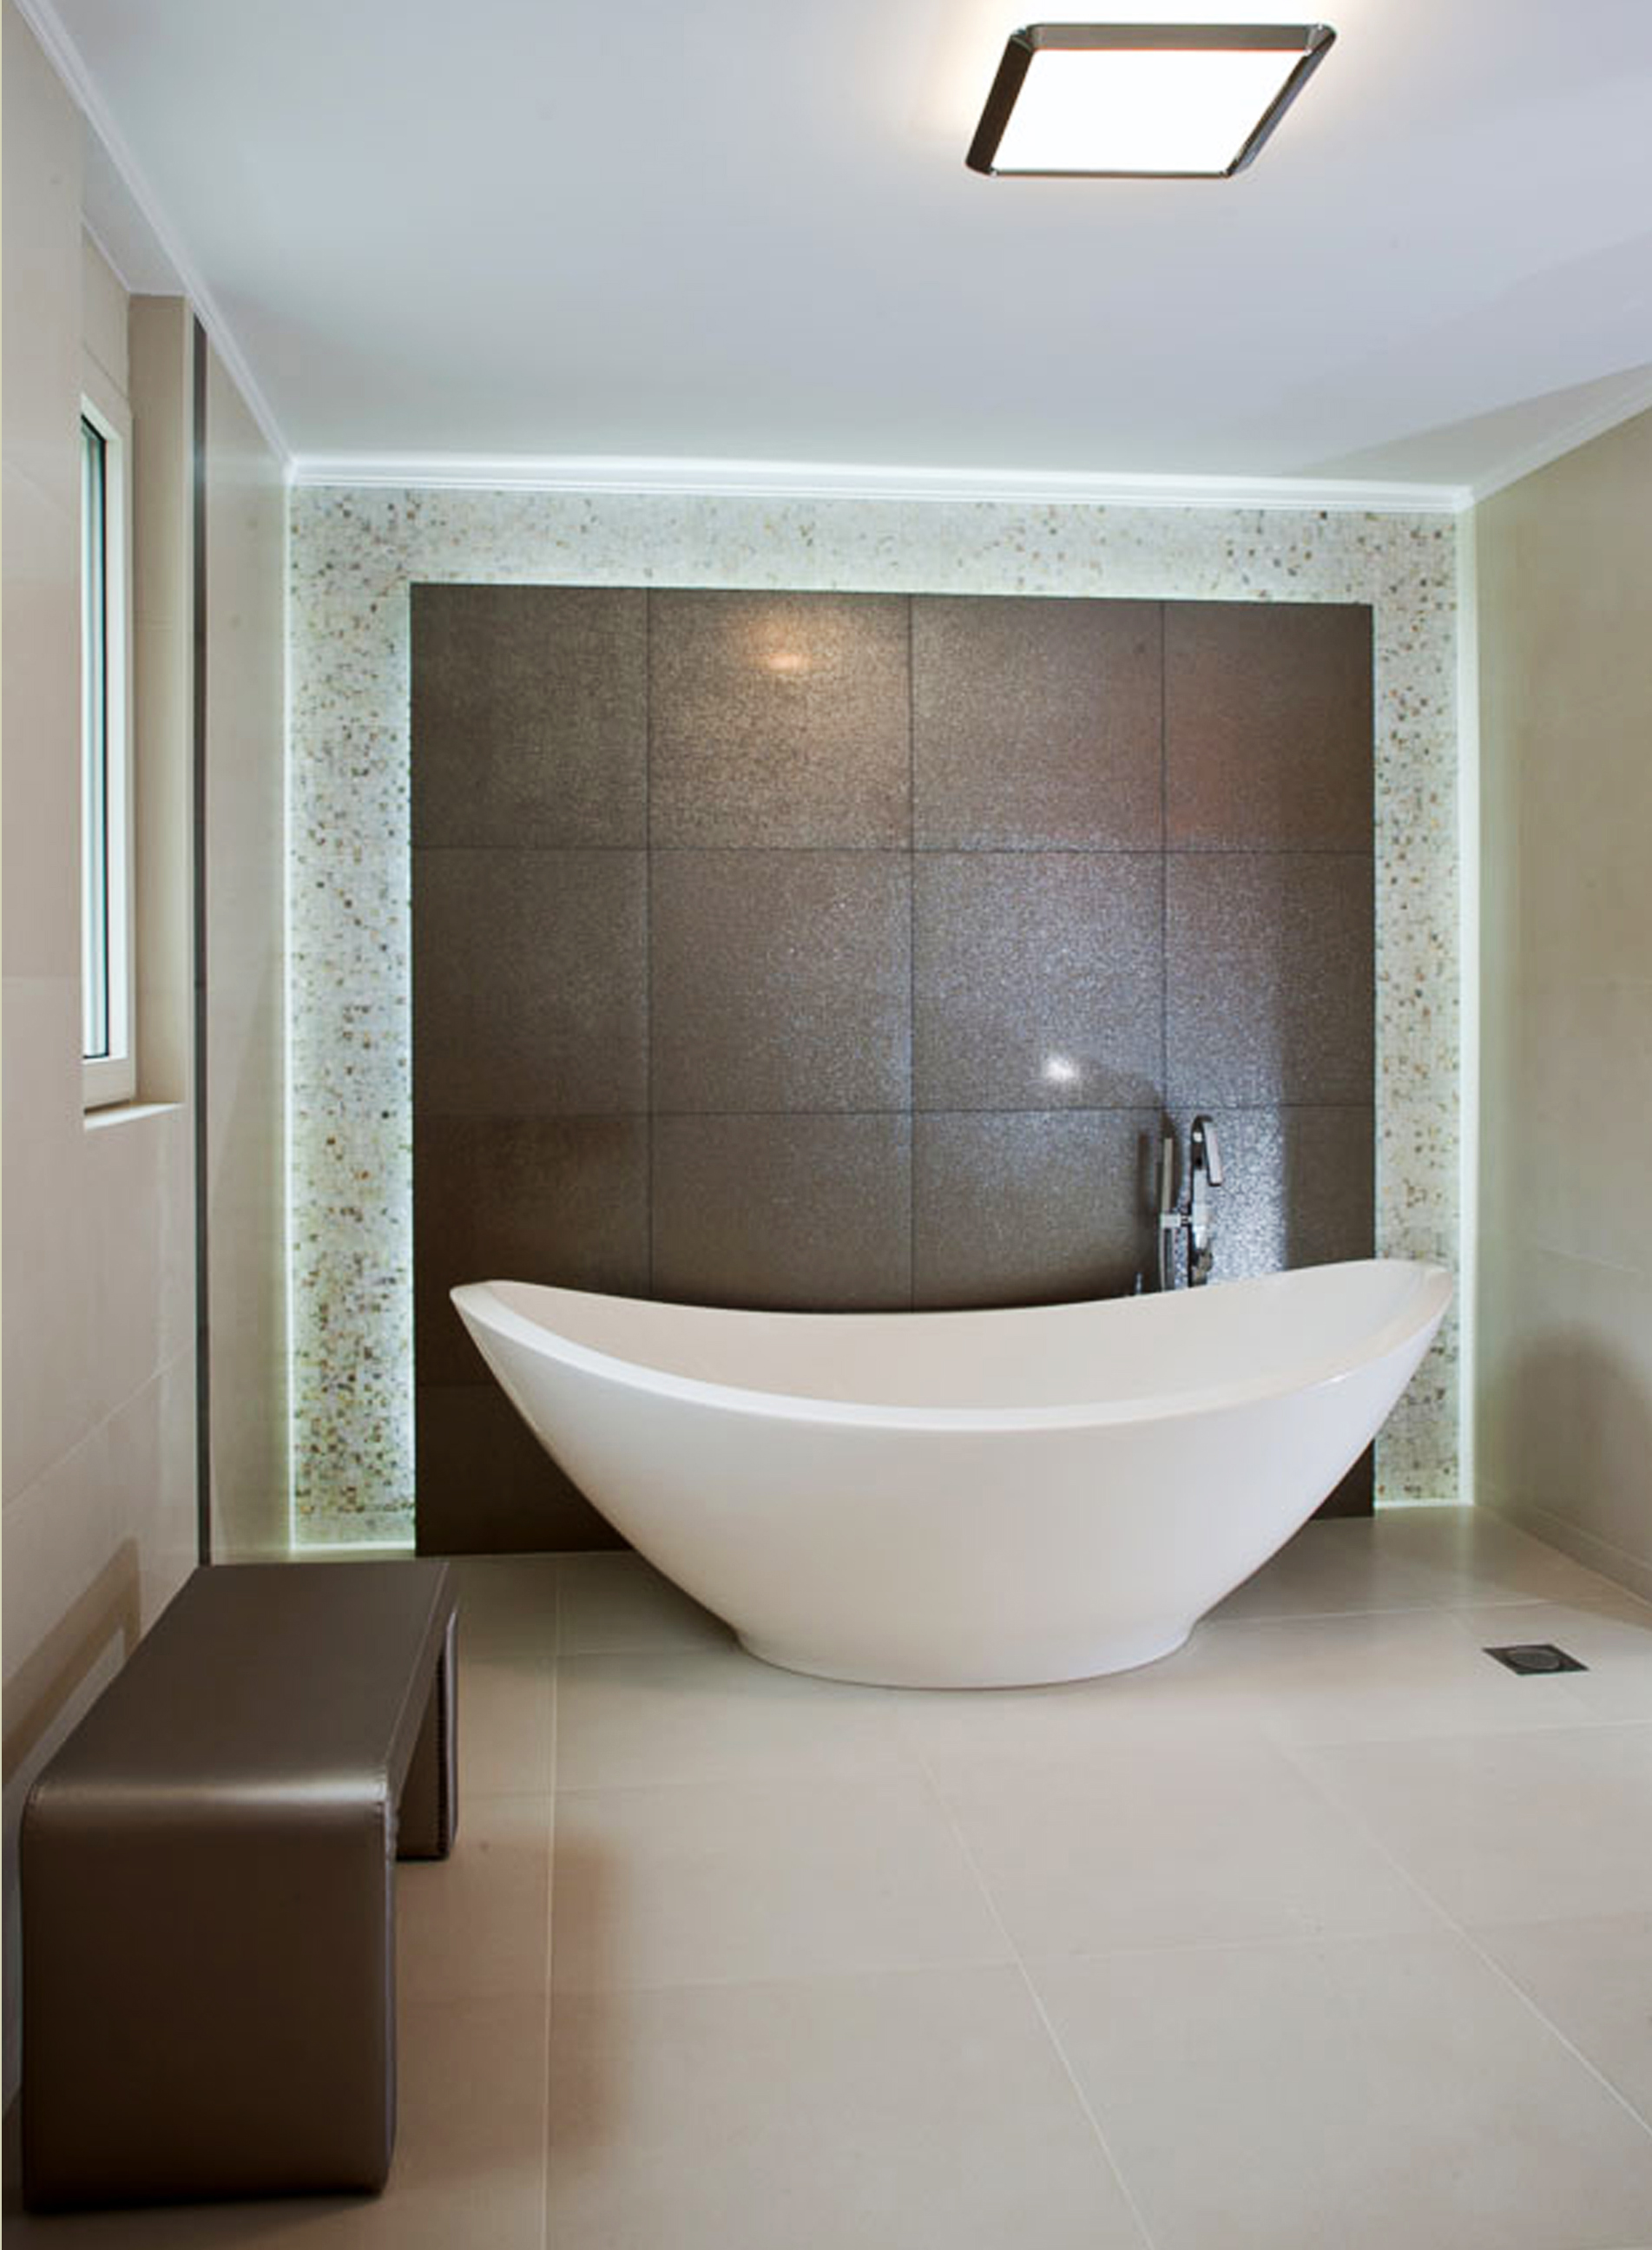 Modern Bedroom Art Modern Art Bedroom Modern Bedroom Abstract Wallpaper Master